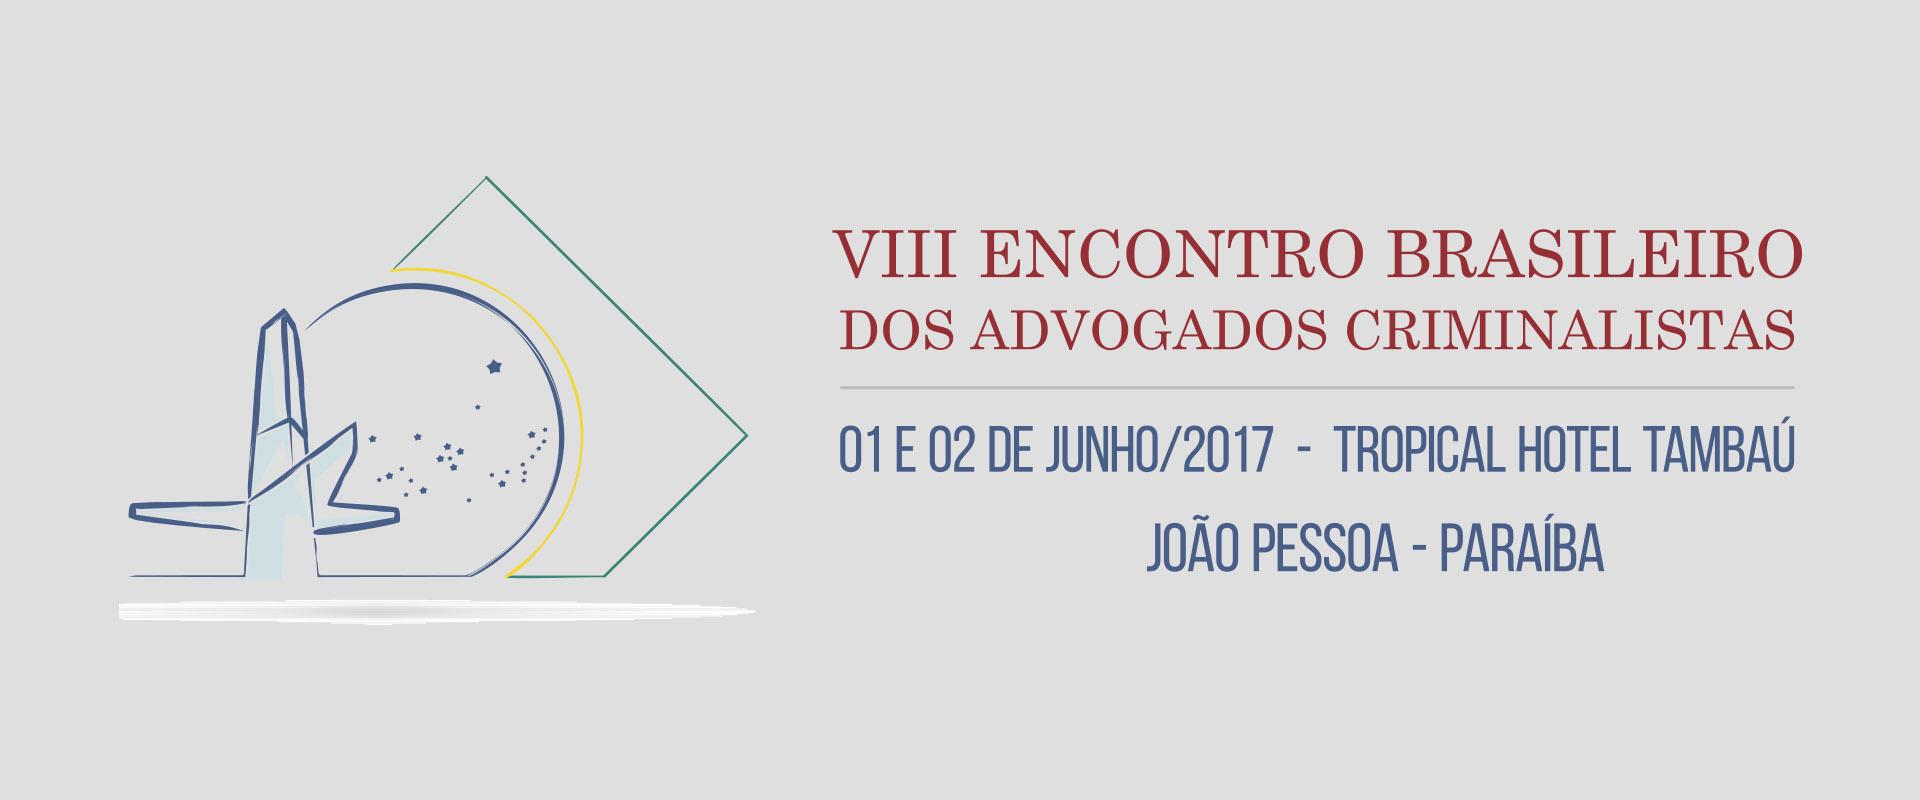 VIII Encontro Brasileiro dos Advogados Criminalistas